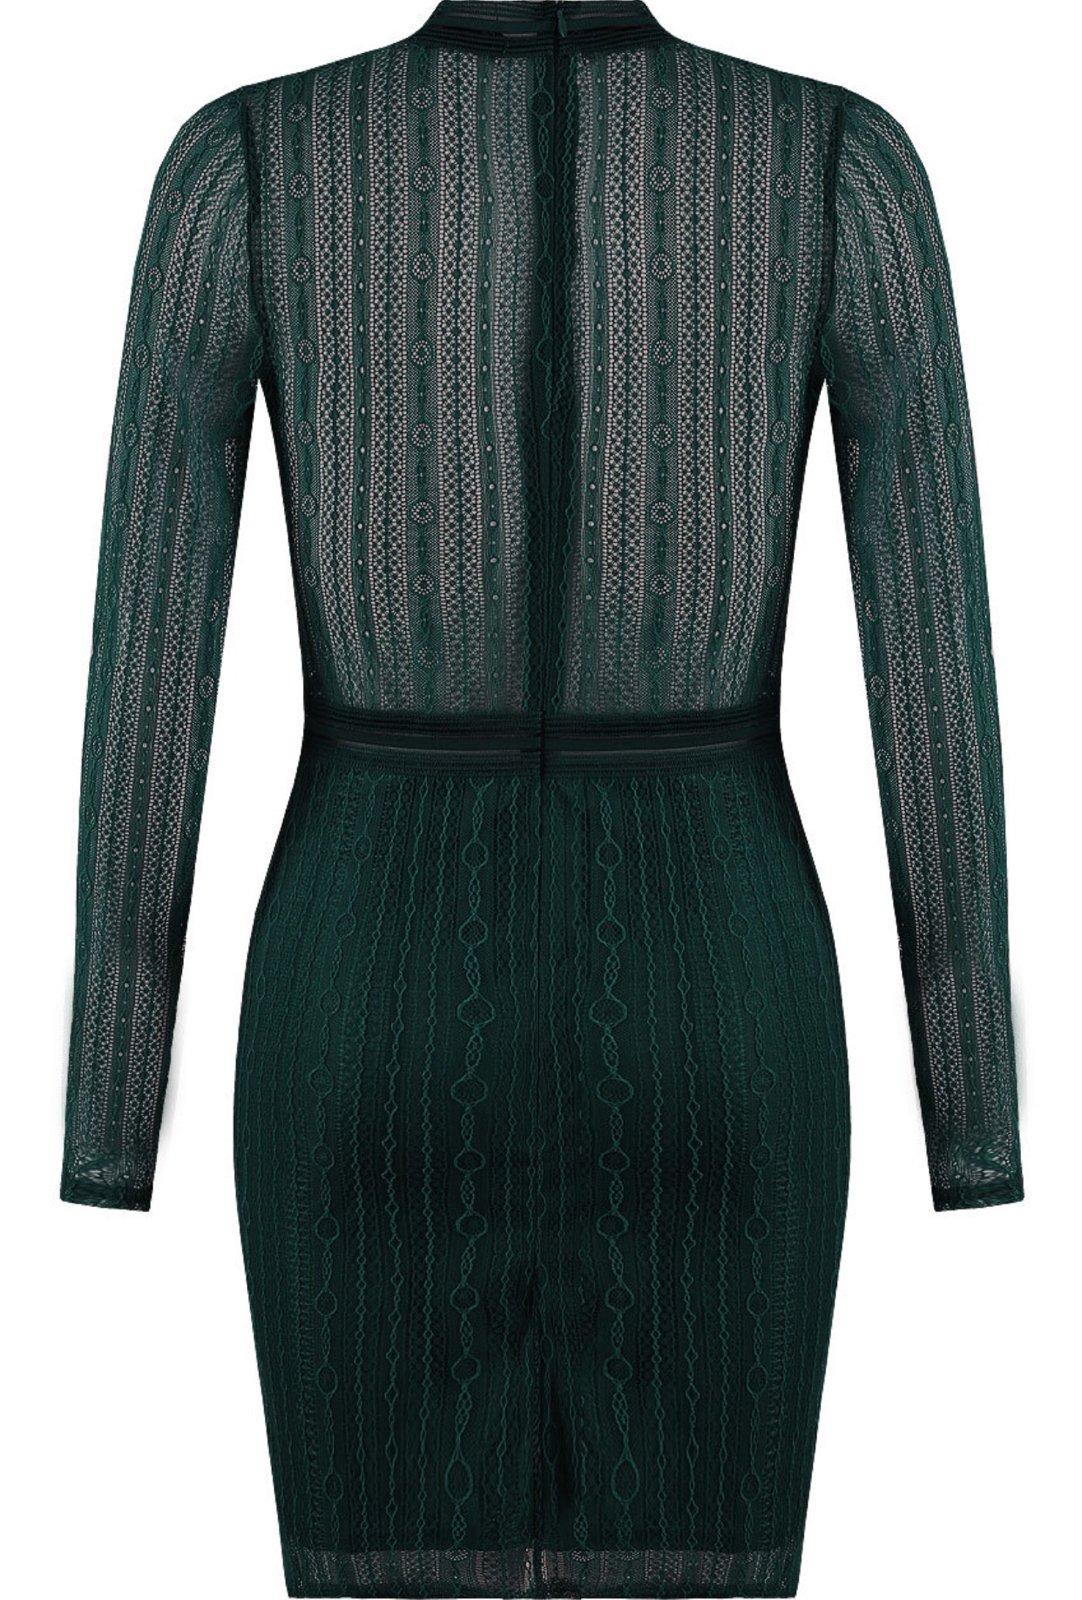 Image of Tori dress